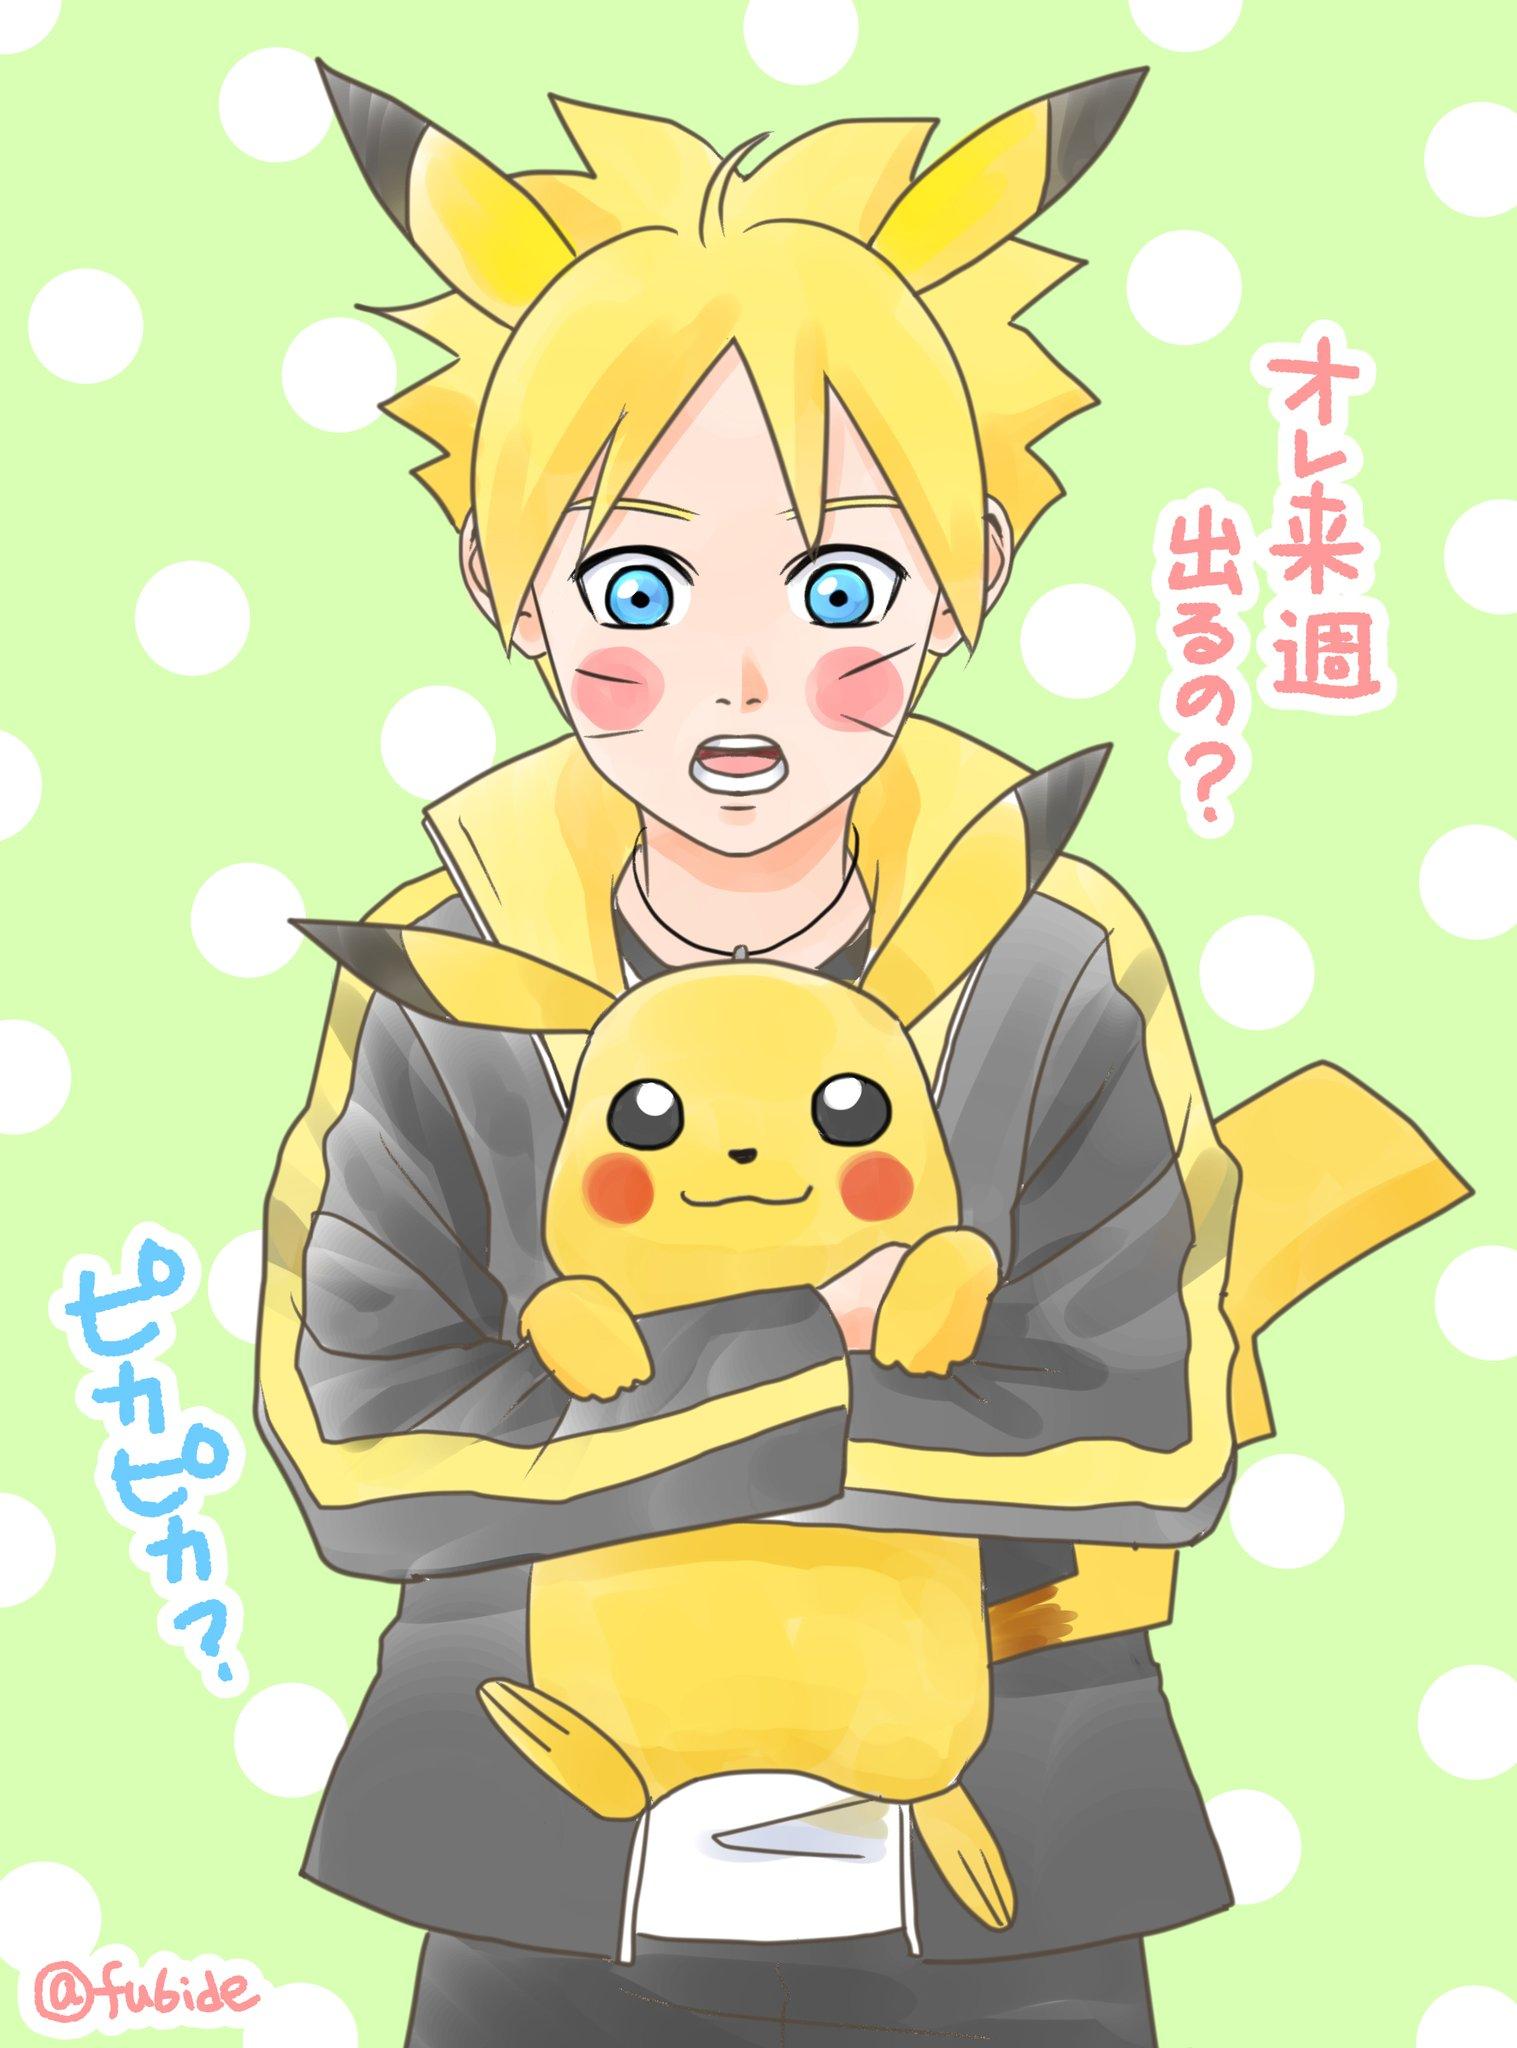 Boruto and pikachu